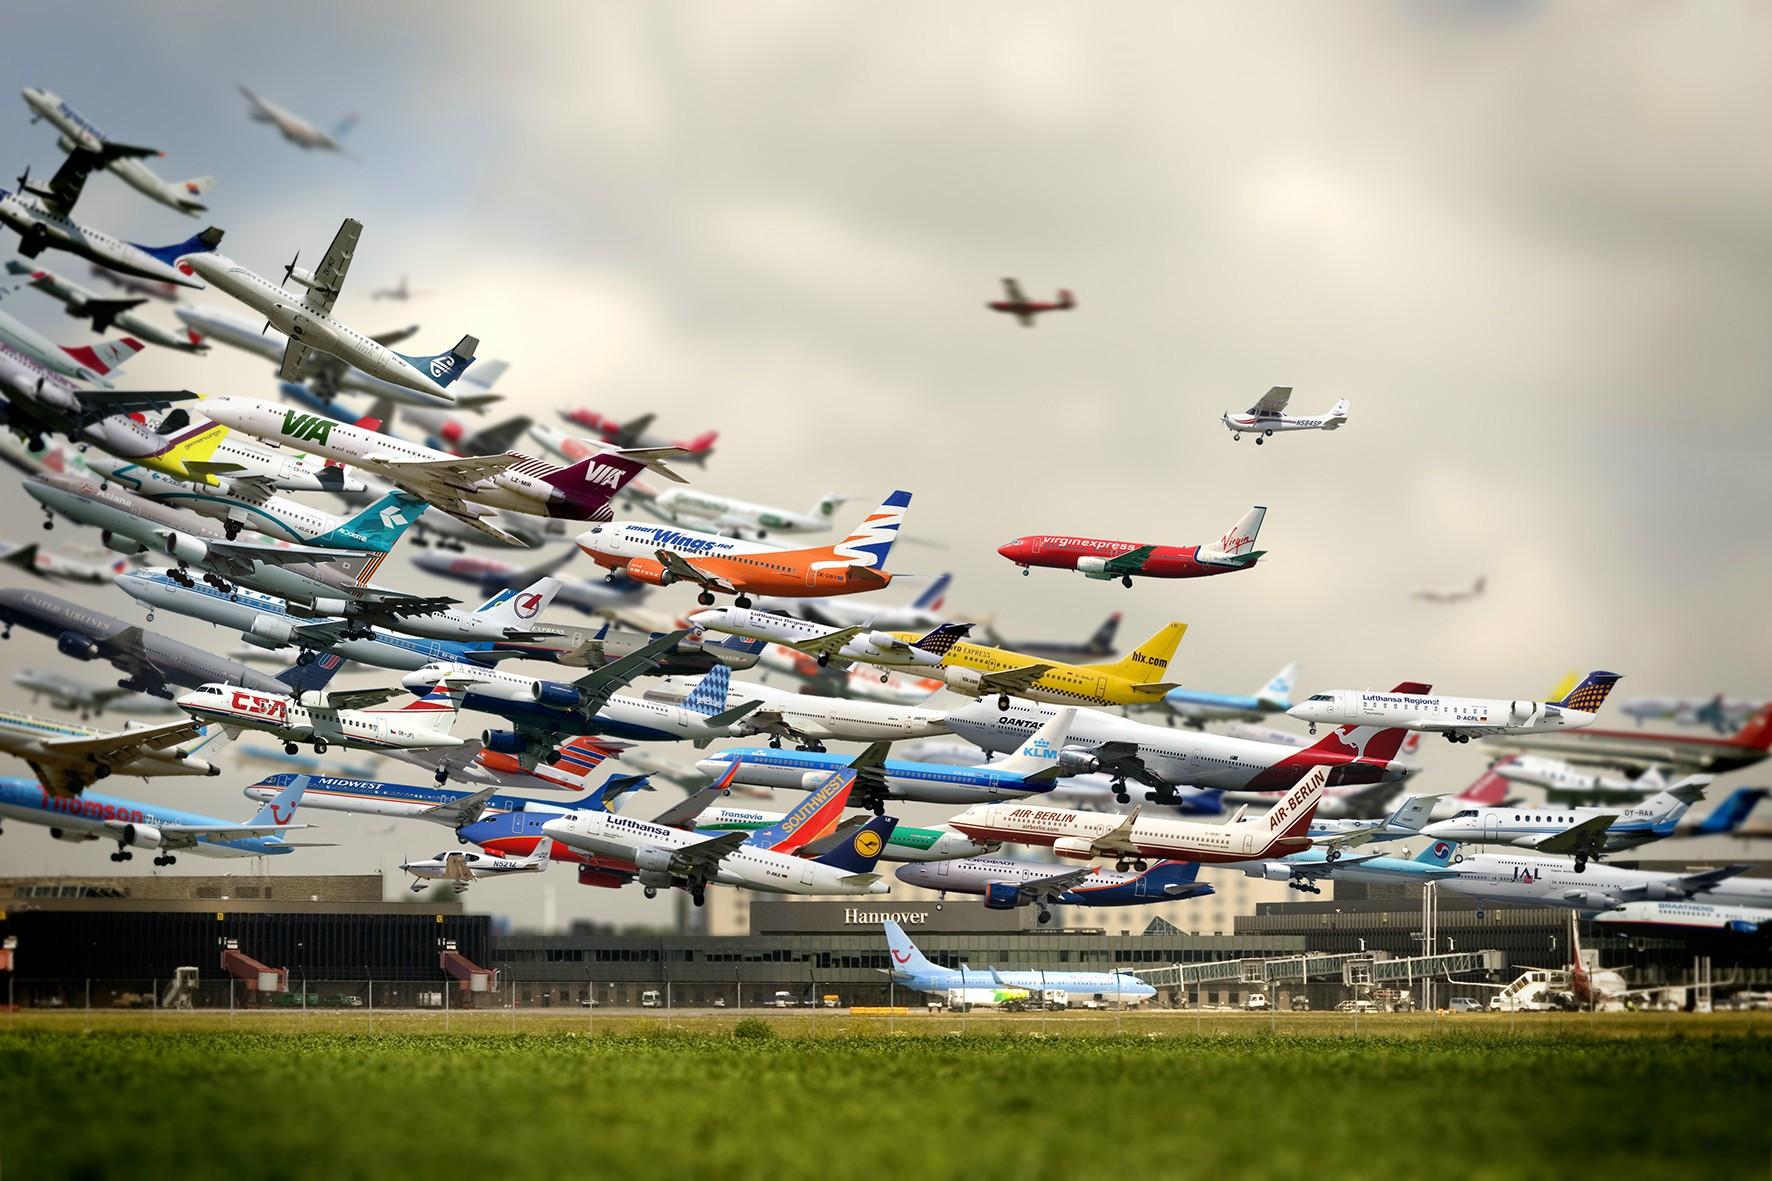 day-at-airport.jpg